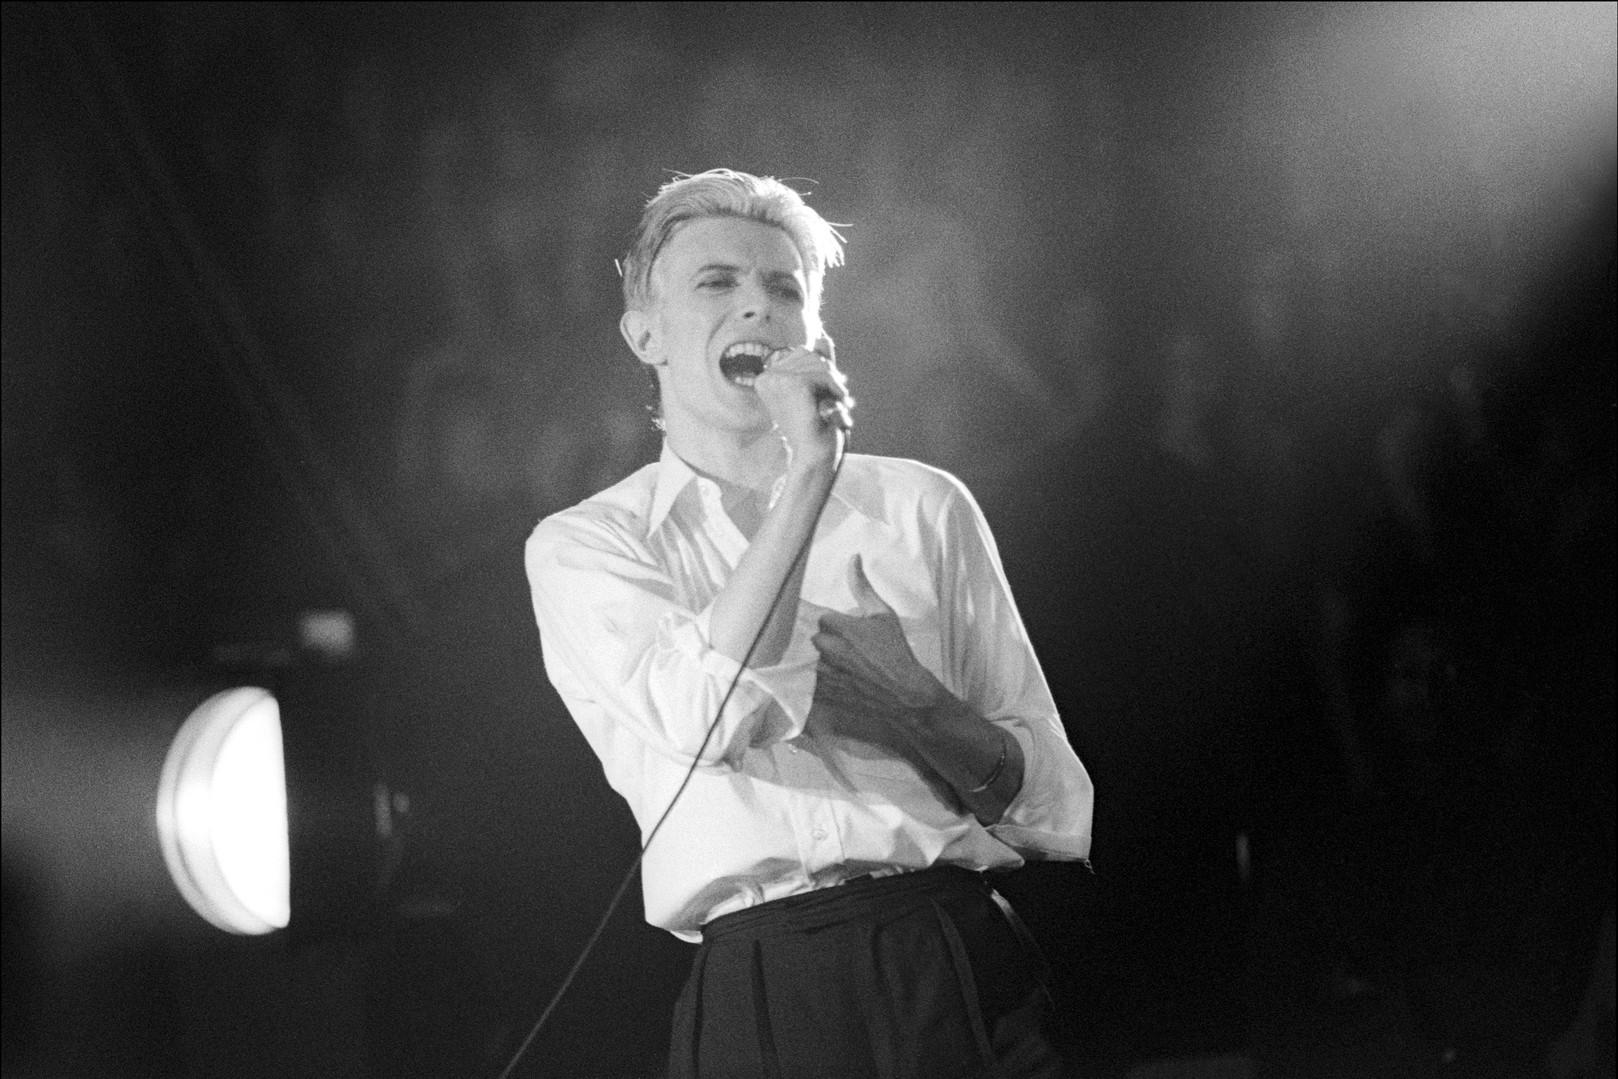 David_Bowie_MSG.jpg